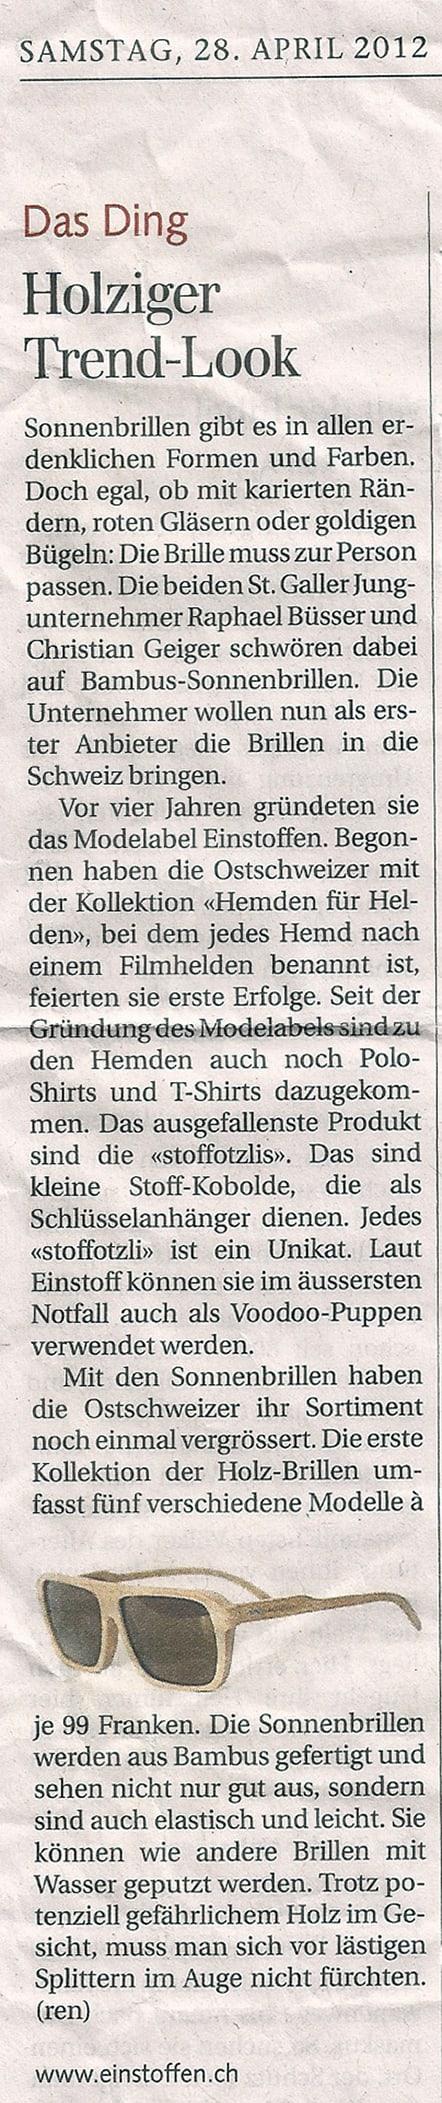 Tagblatt Holzsonnenbrillen